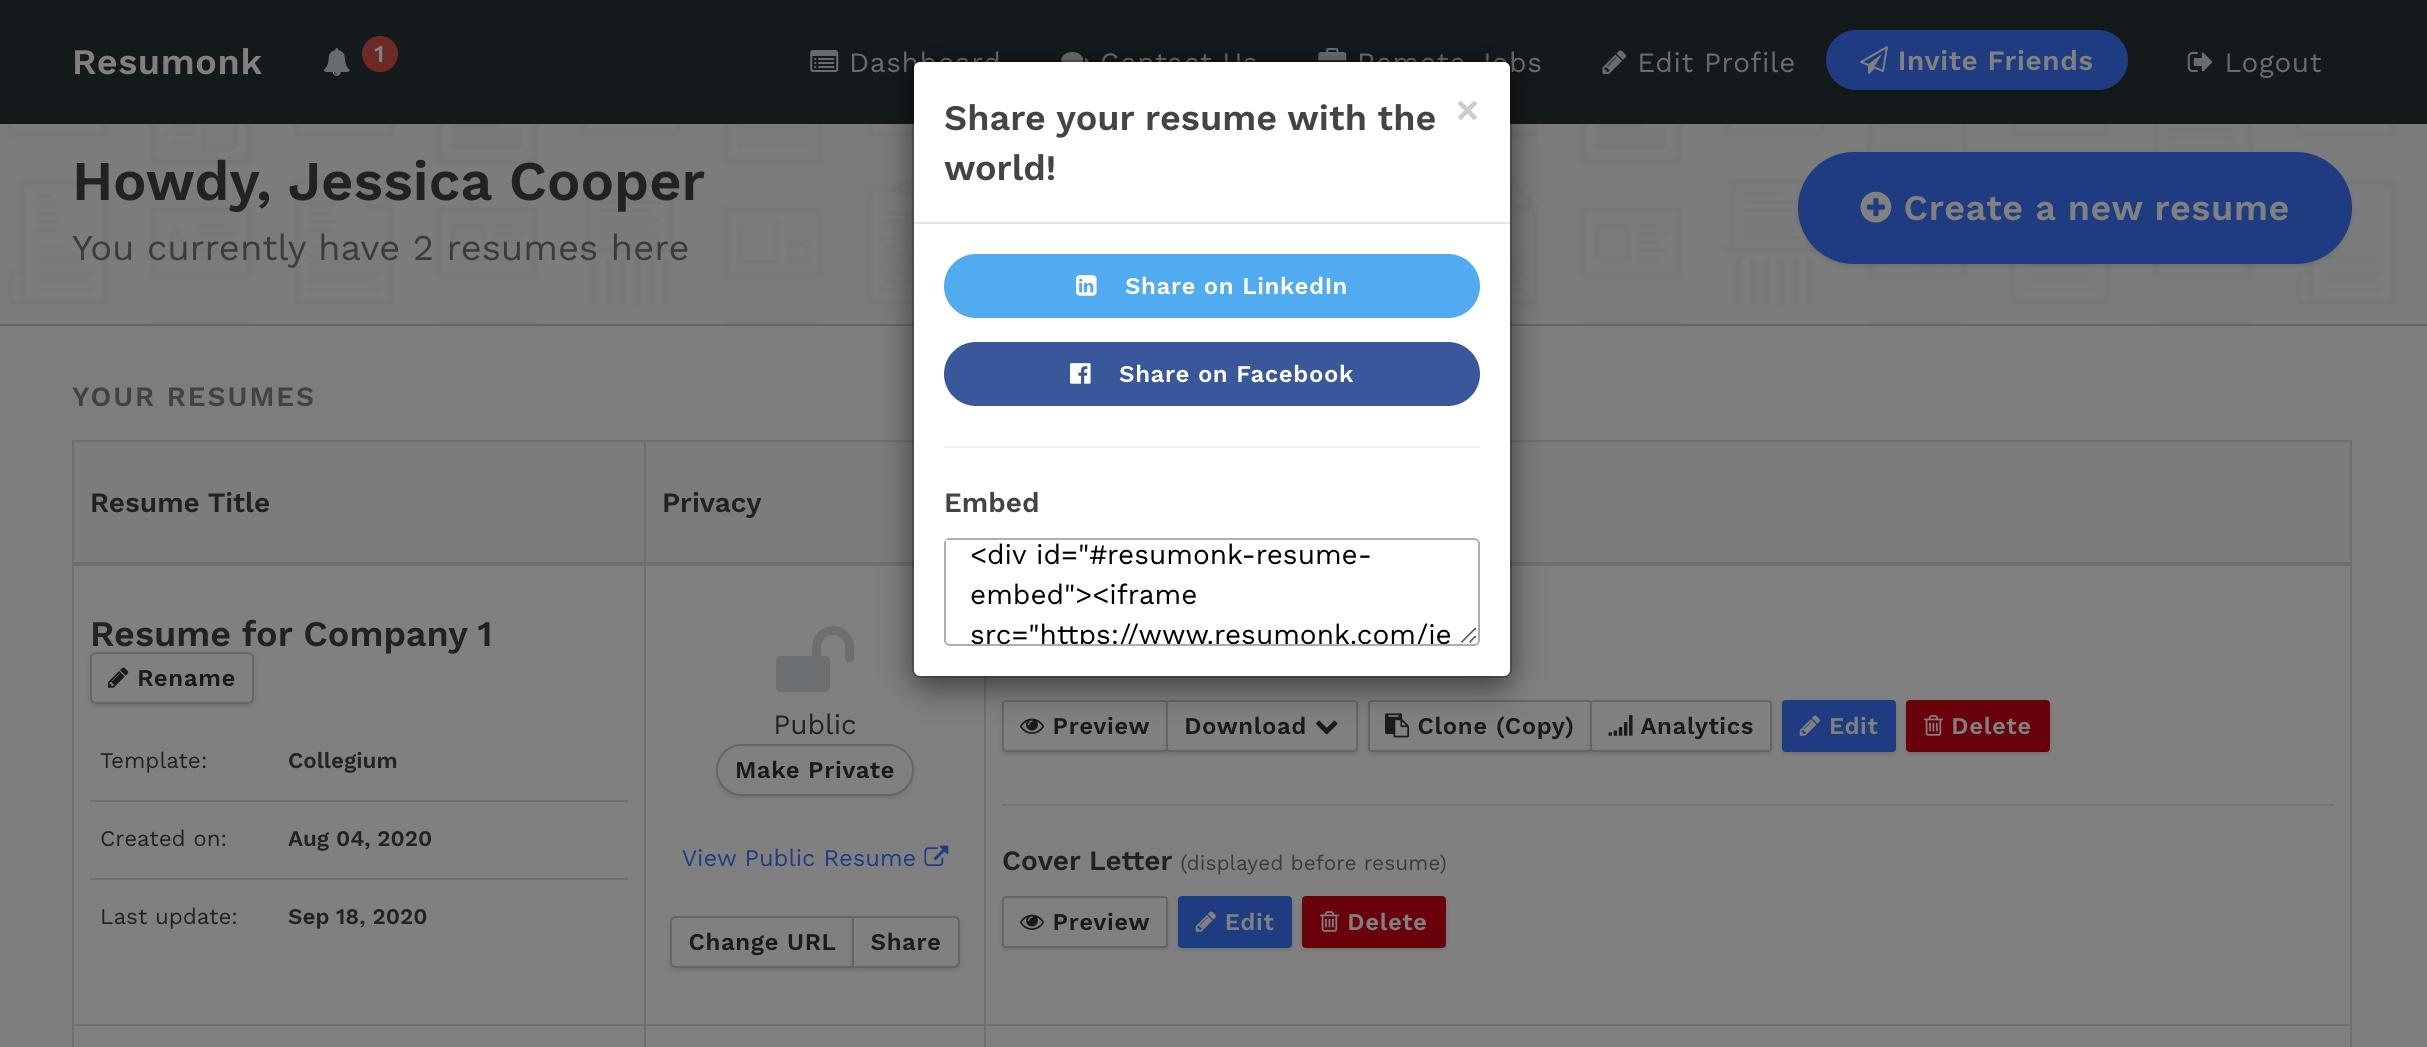 Embed Resume